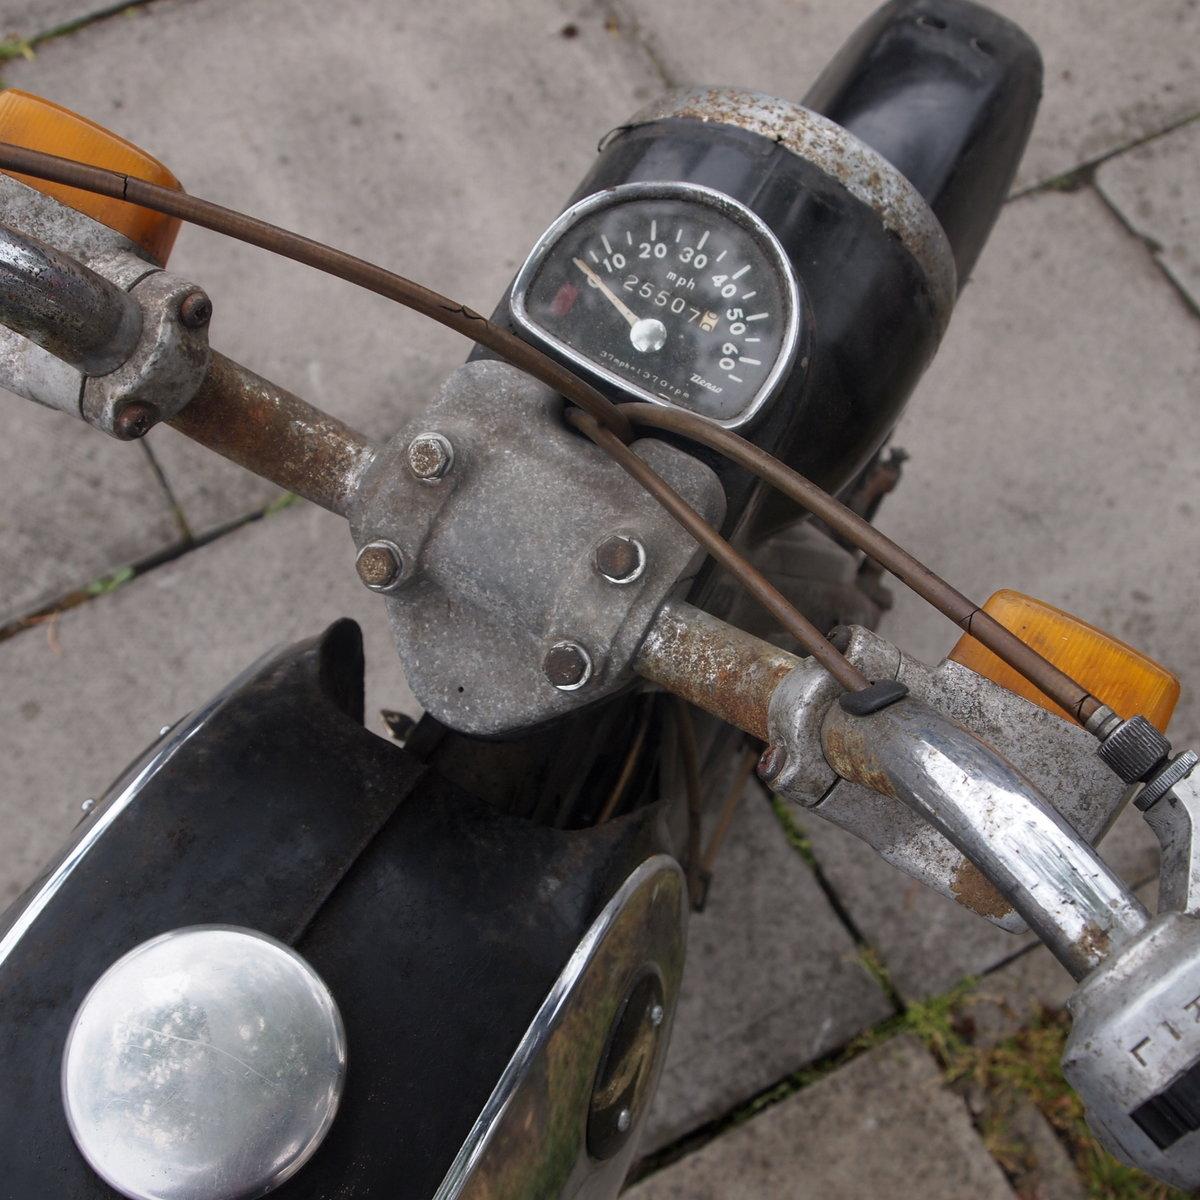 1967 Honda C200 Original Running UK Bike, RESERVED FOR ALAN. SOLD (picture 6 of 6)